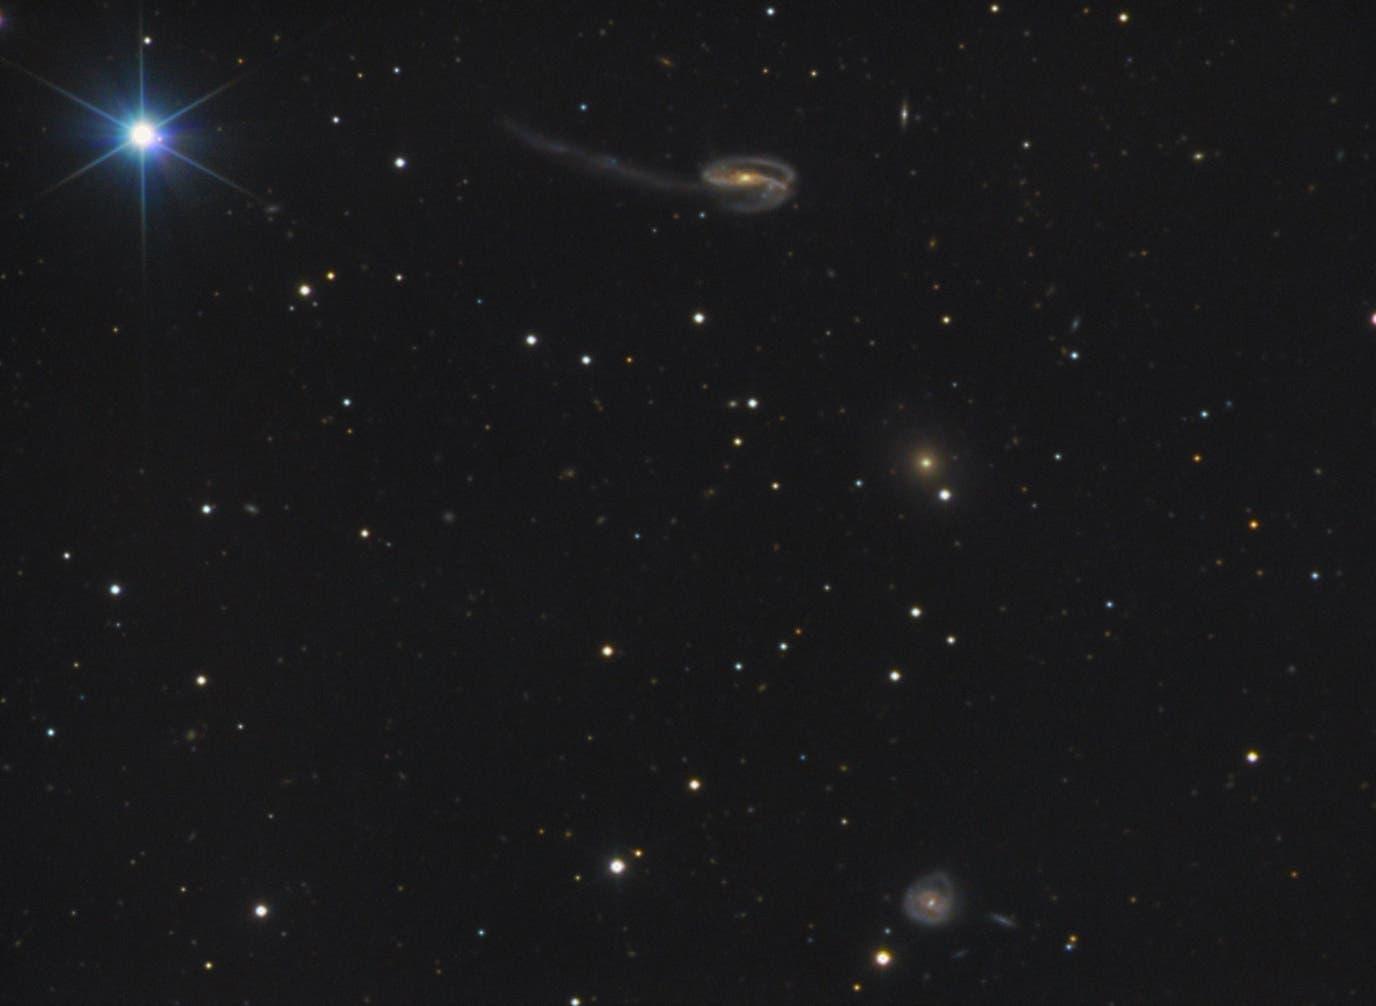 Arp 188 = UGC 10214 Tadpole Galaxy